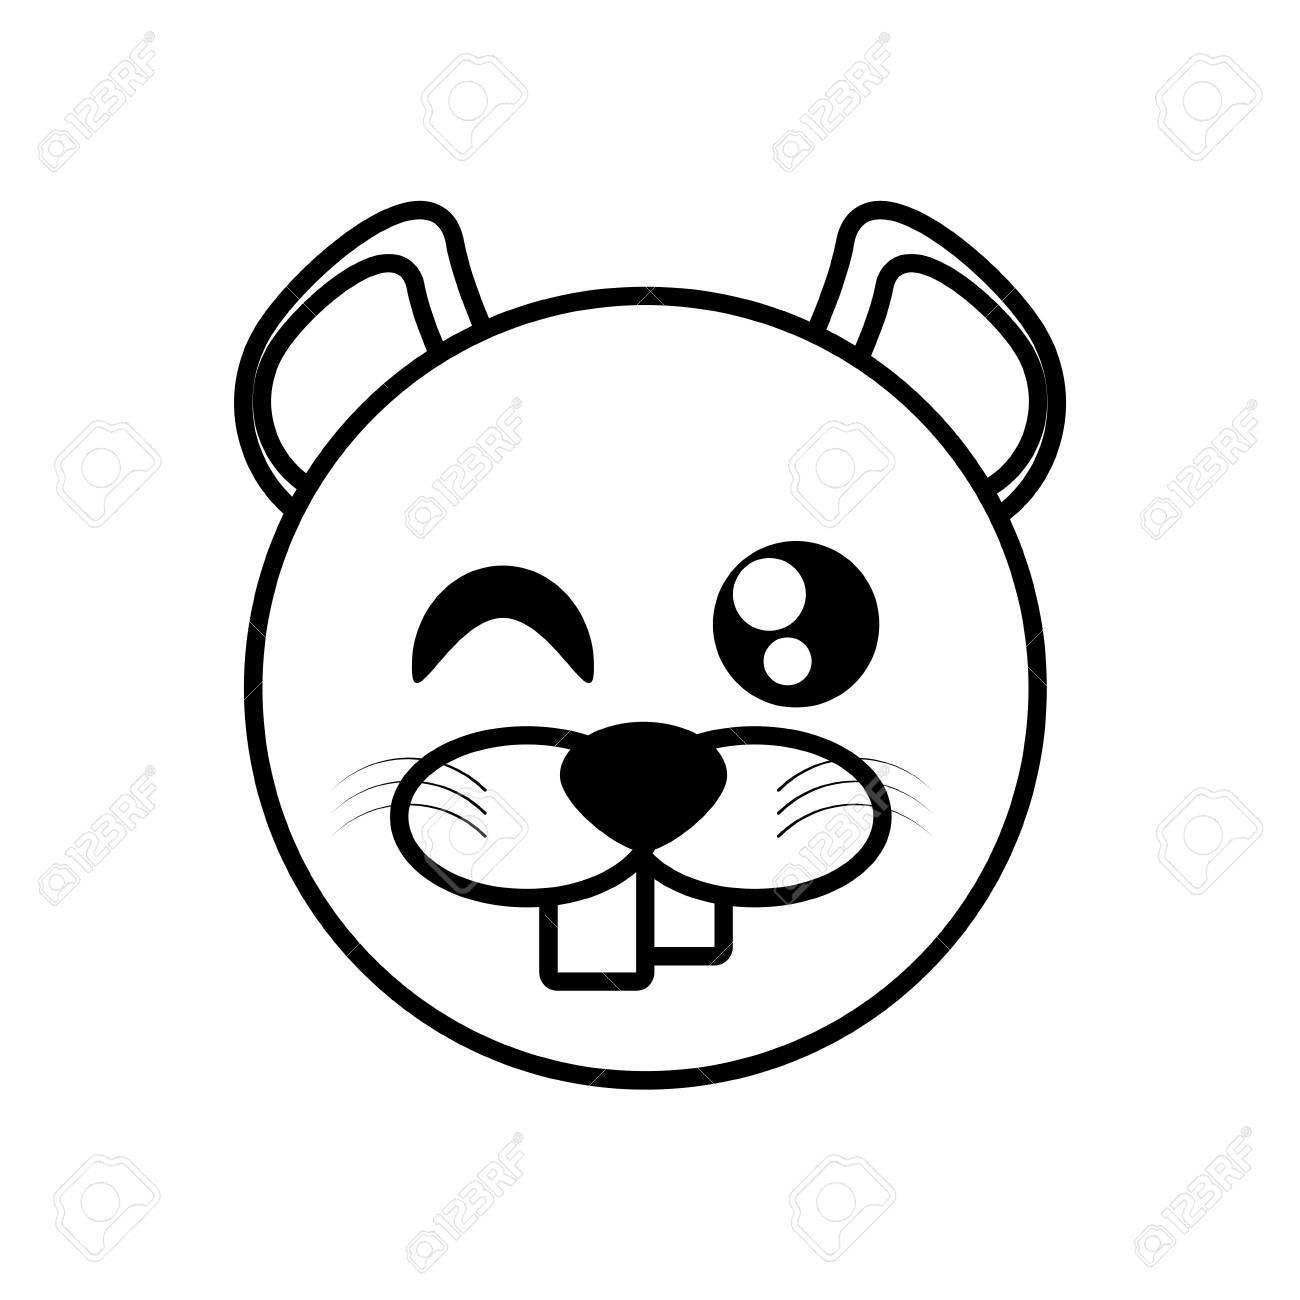 1300x1300 Outline Beaver Head Animal Vector Illustration Eps 10 Royalty Free